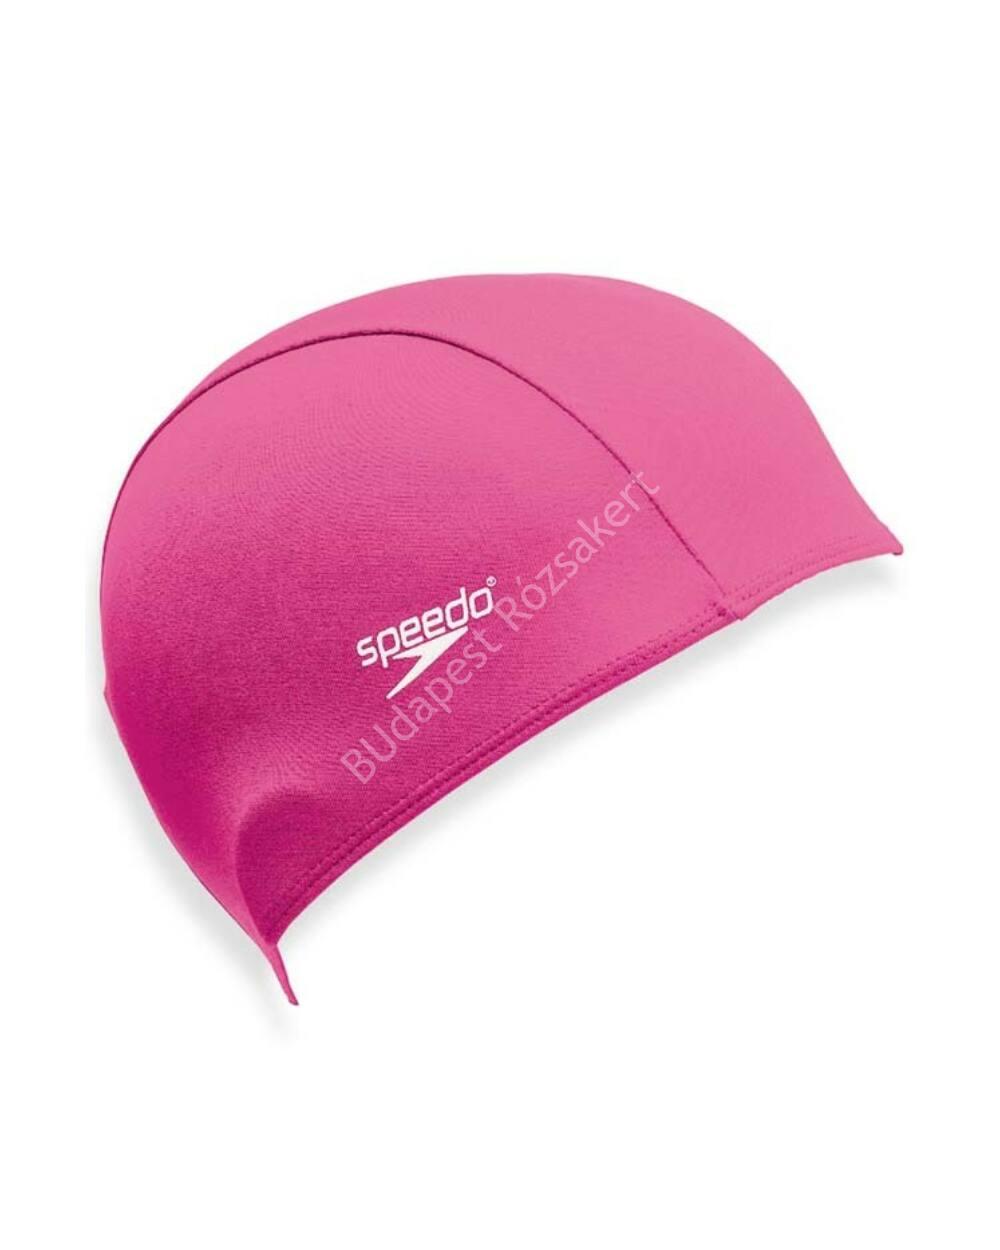 Speedo junior poliészter úszósapka, pink